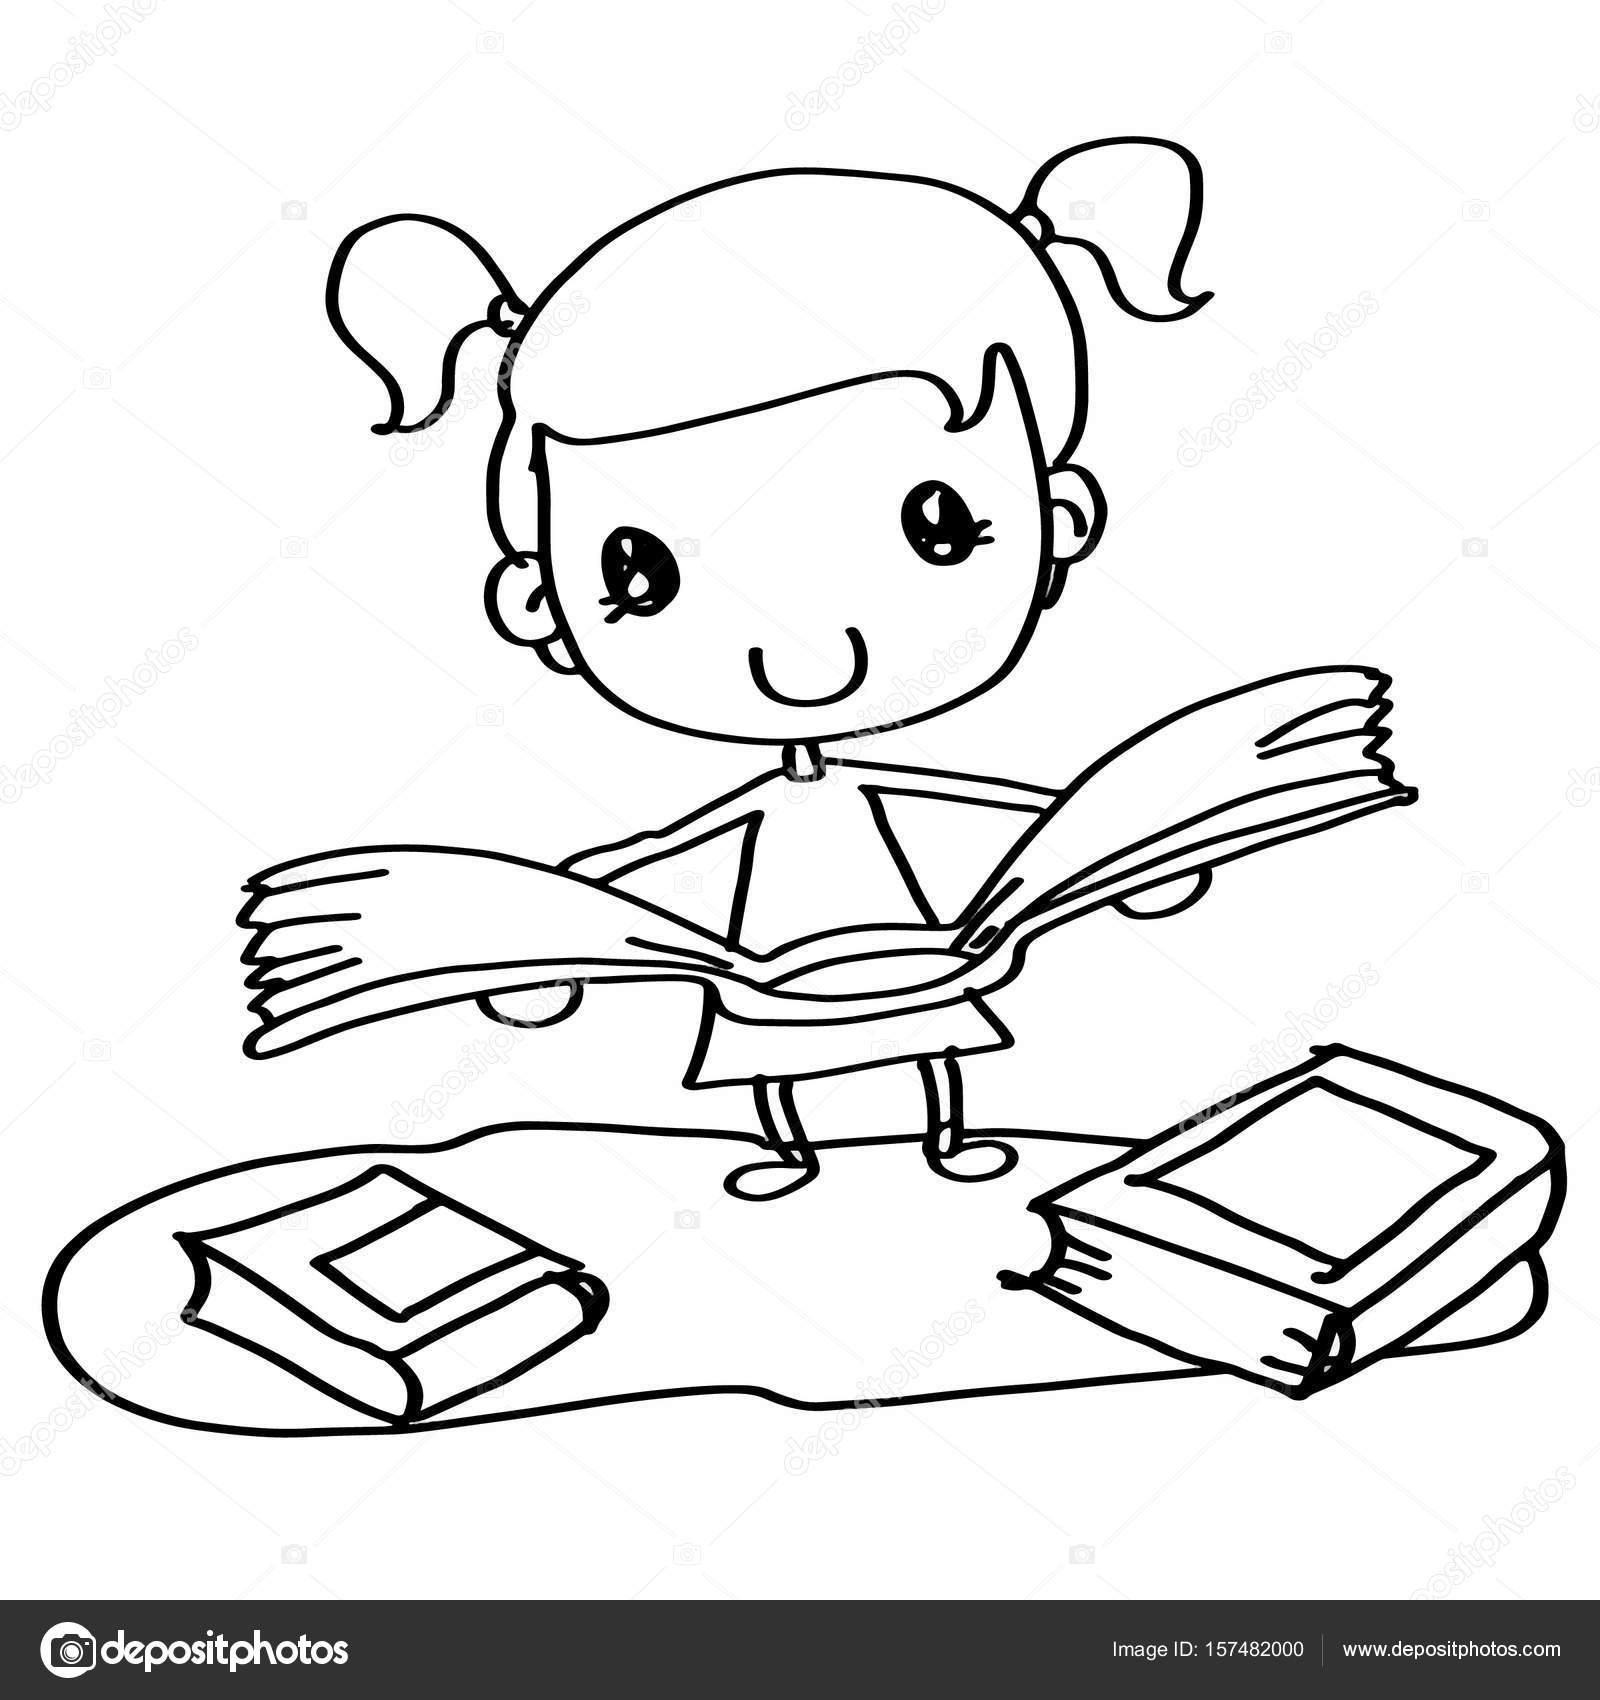 Sevimli Kız Bir Kitap Boyama Okuma Stok Foto Designartks 157482000